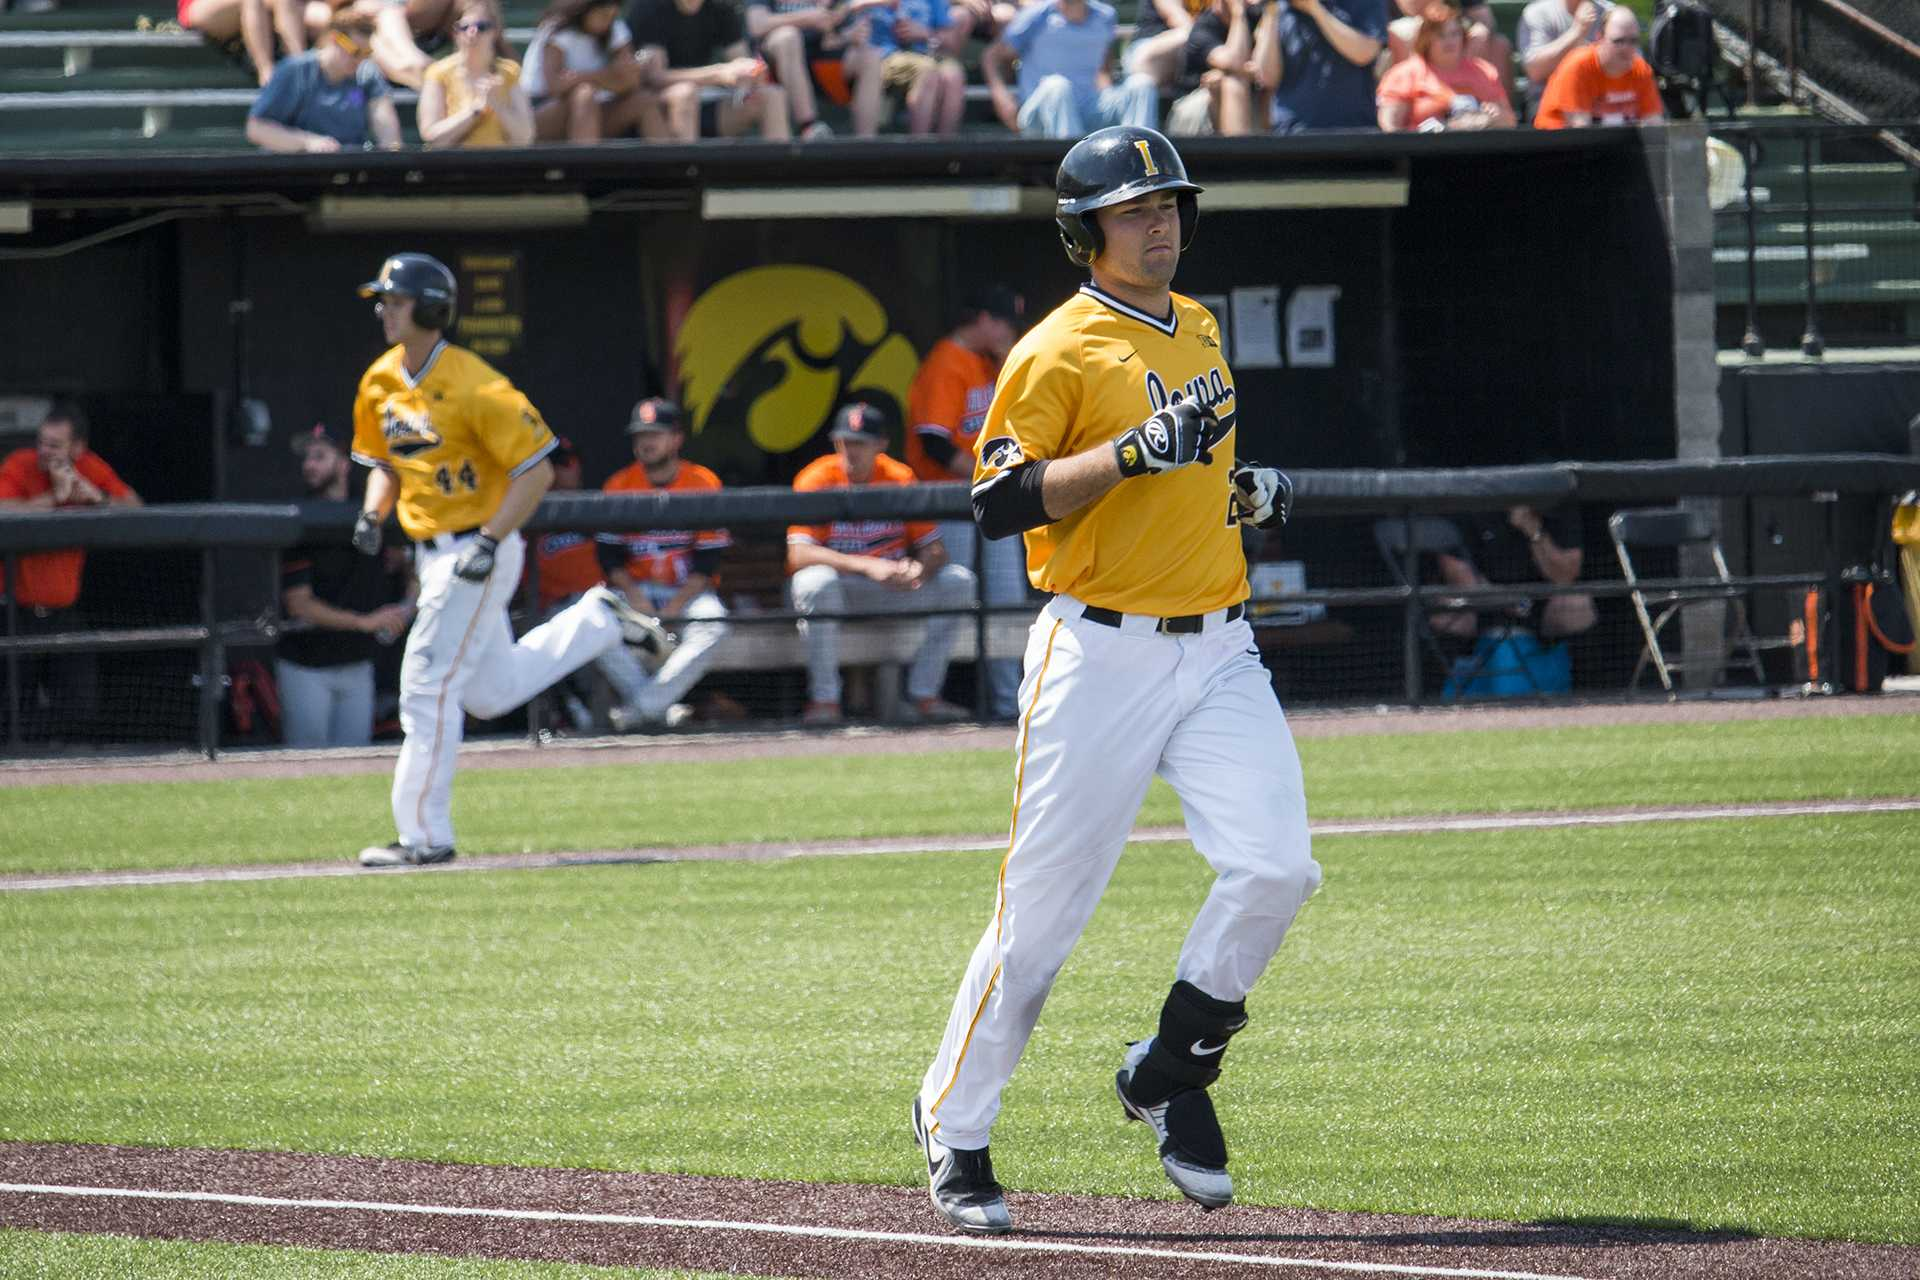 Iowa baseball beats Penn State, clinches Big Ten Tournament berth